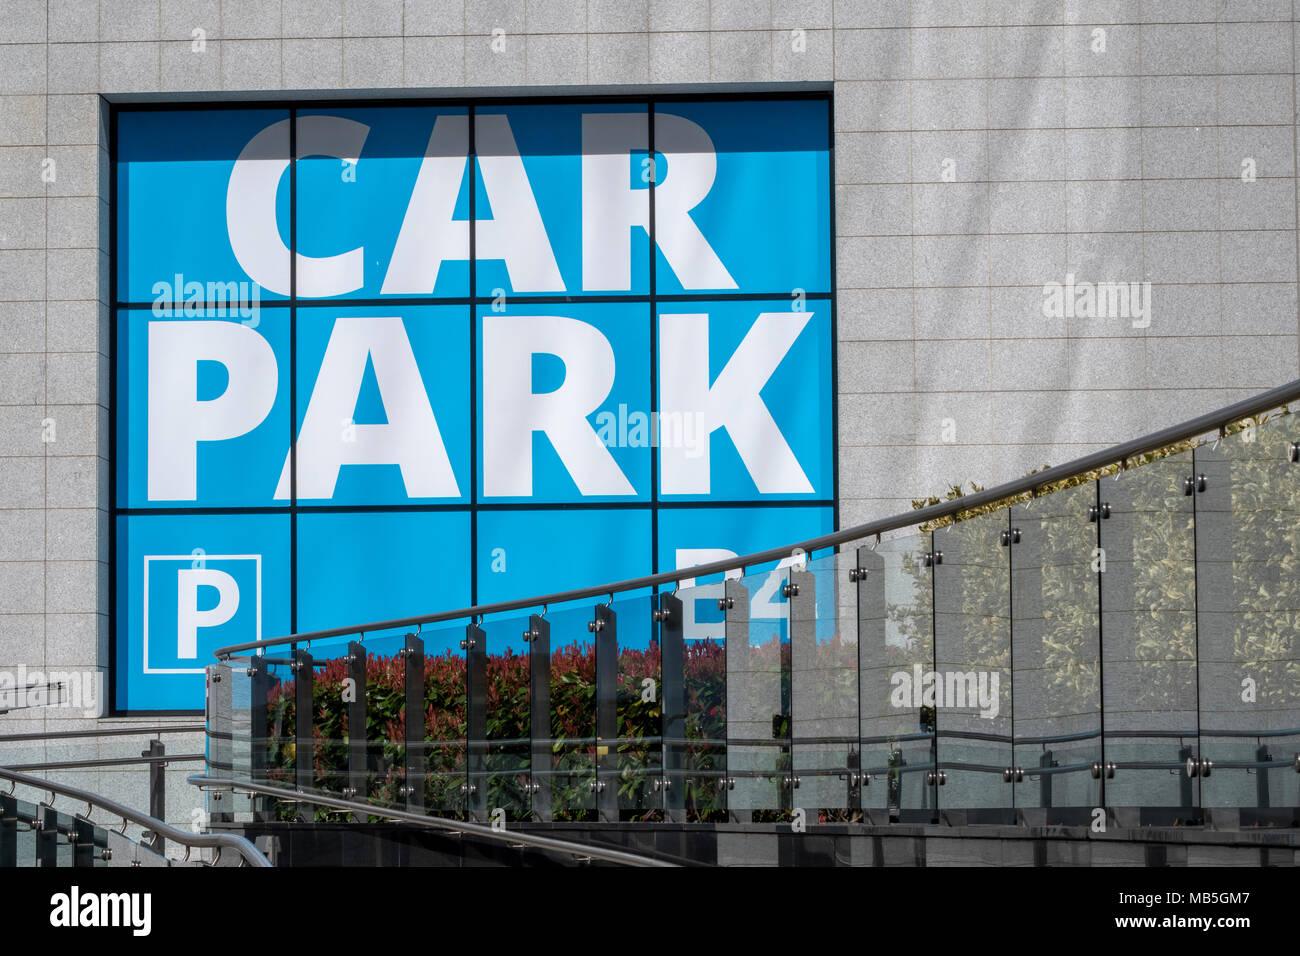 Car park sign, Birmingham - Stock Image